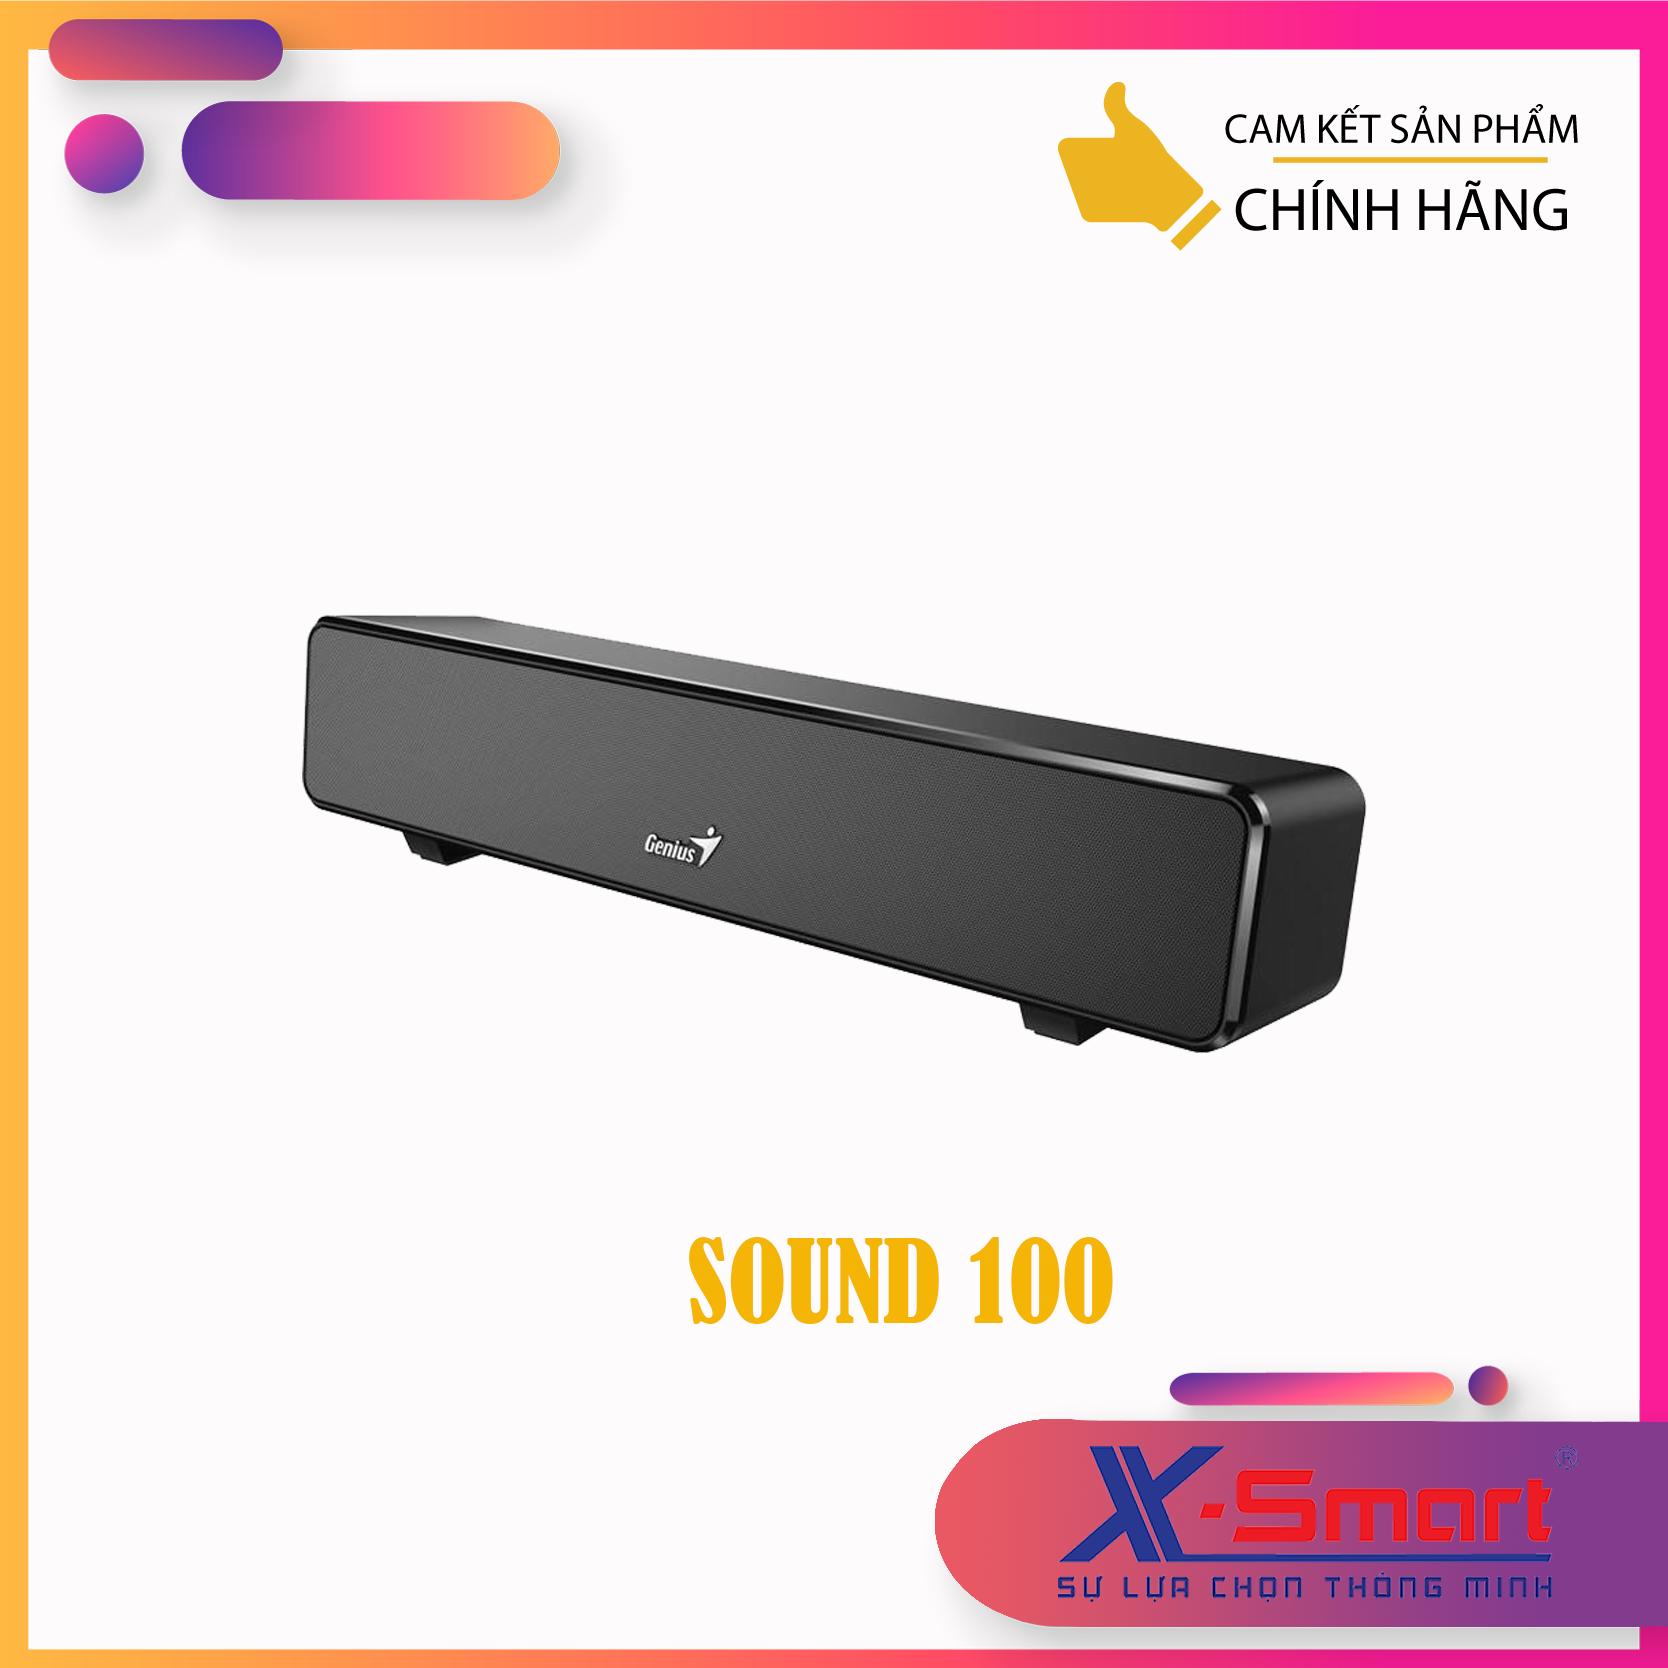 Loa Genius Soundbar 100